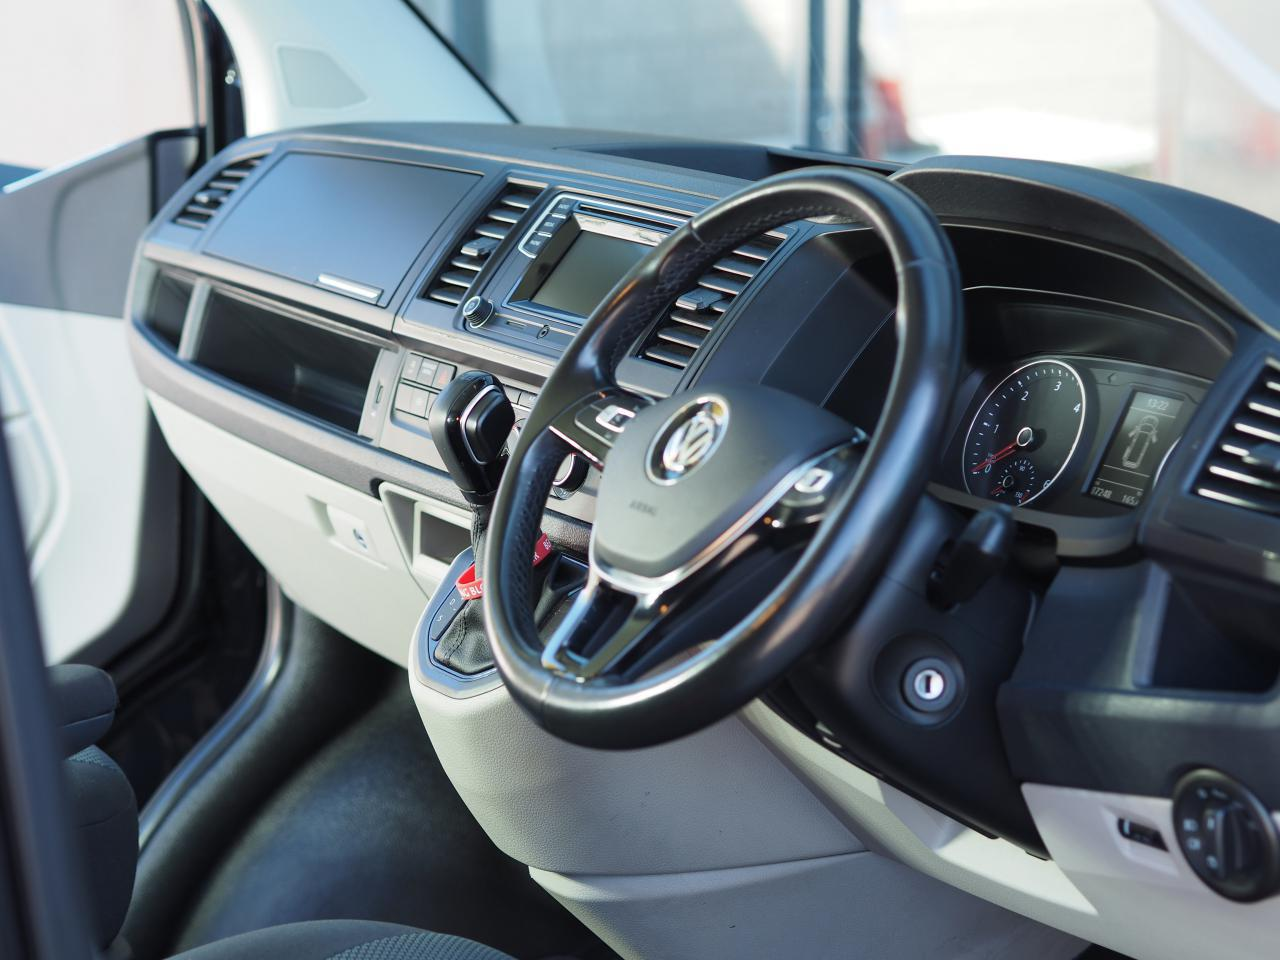 VW T6 Transporter Glove Box Comfort Dash Conversion Matte Black